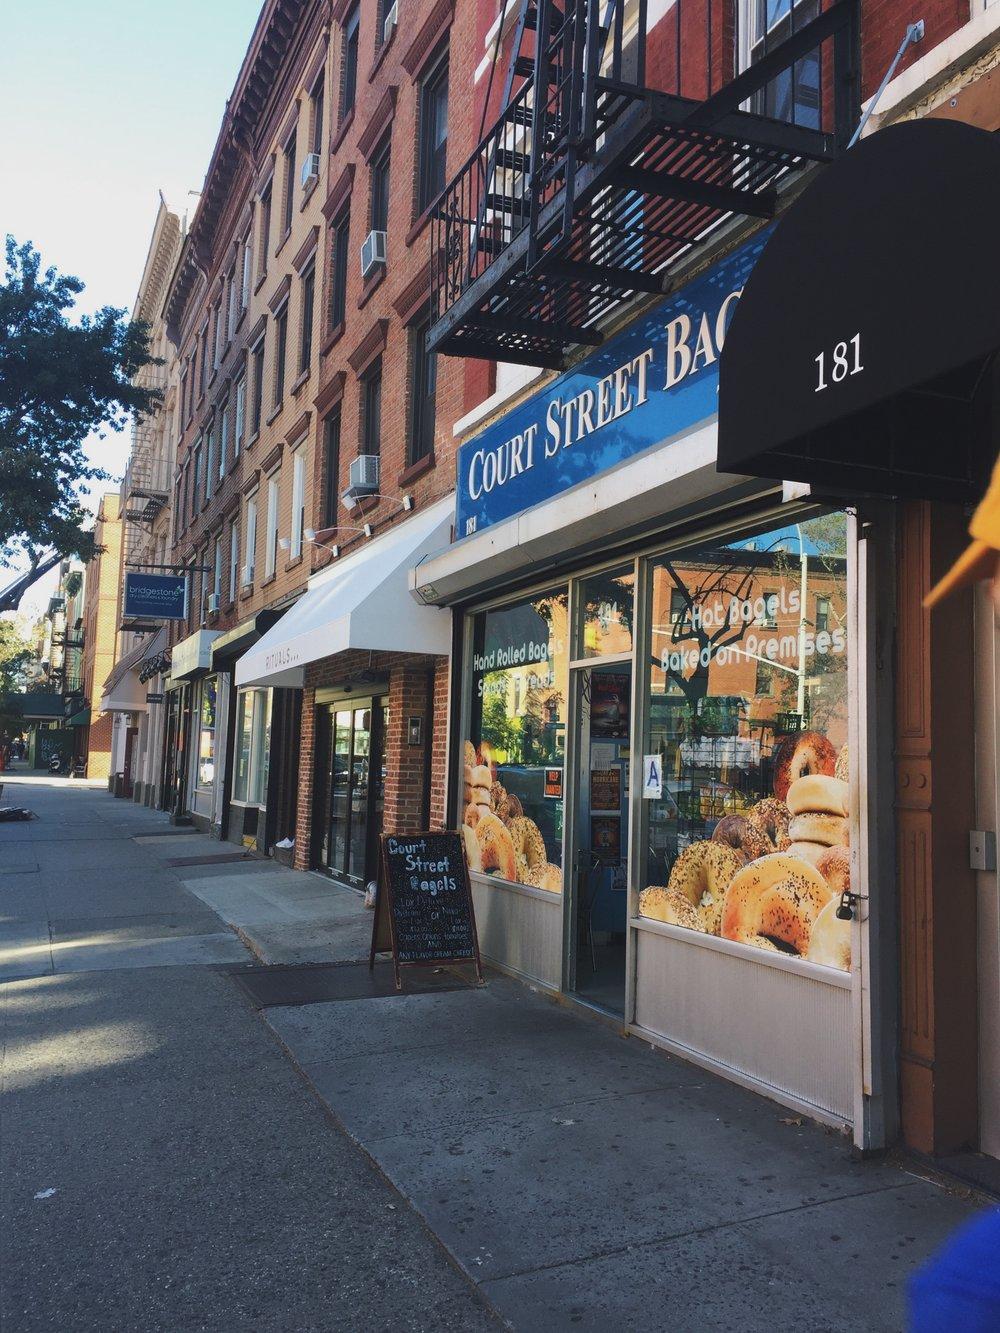 Court Street Bagels, 181 Court St.